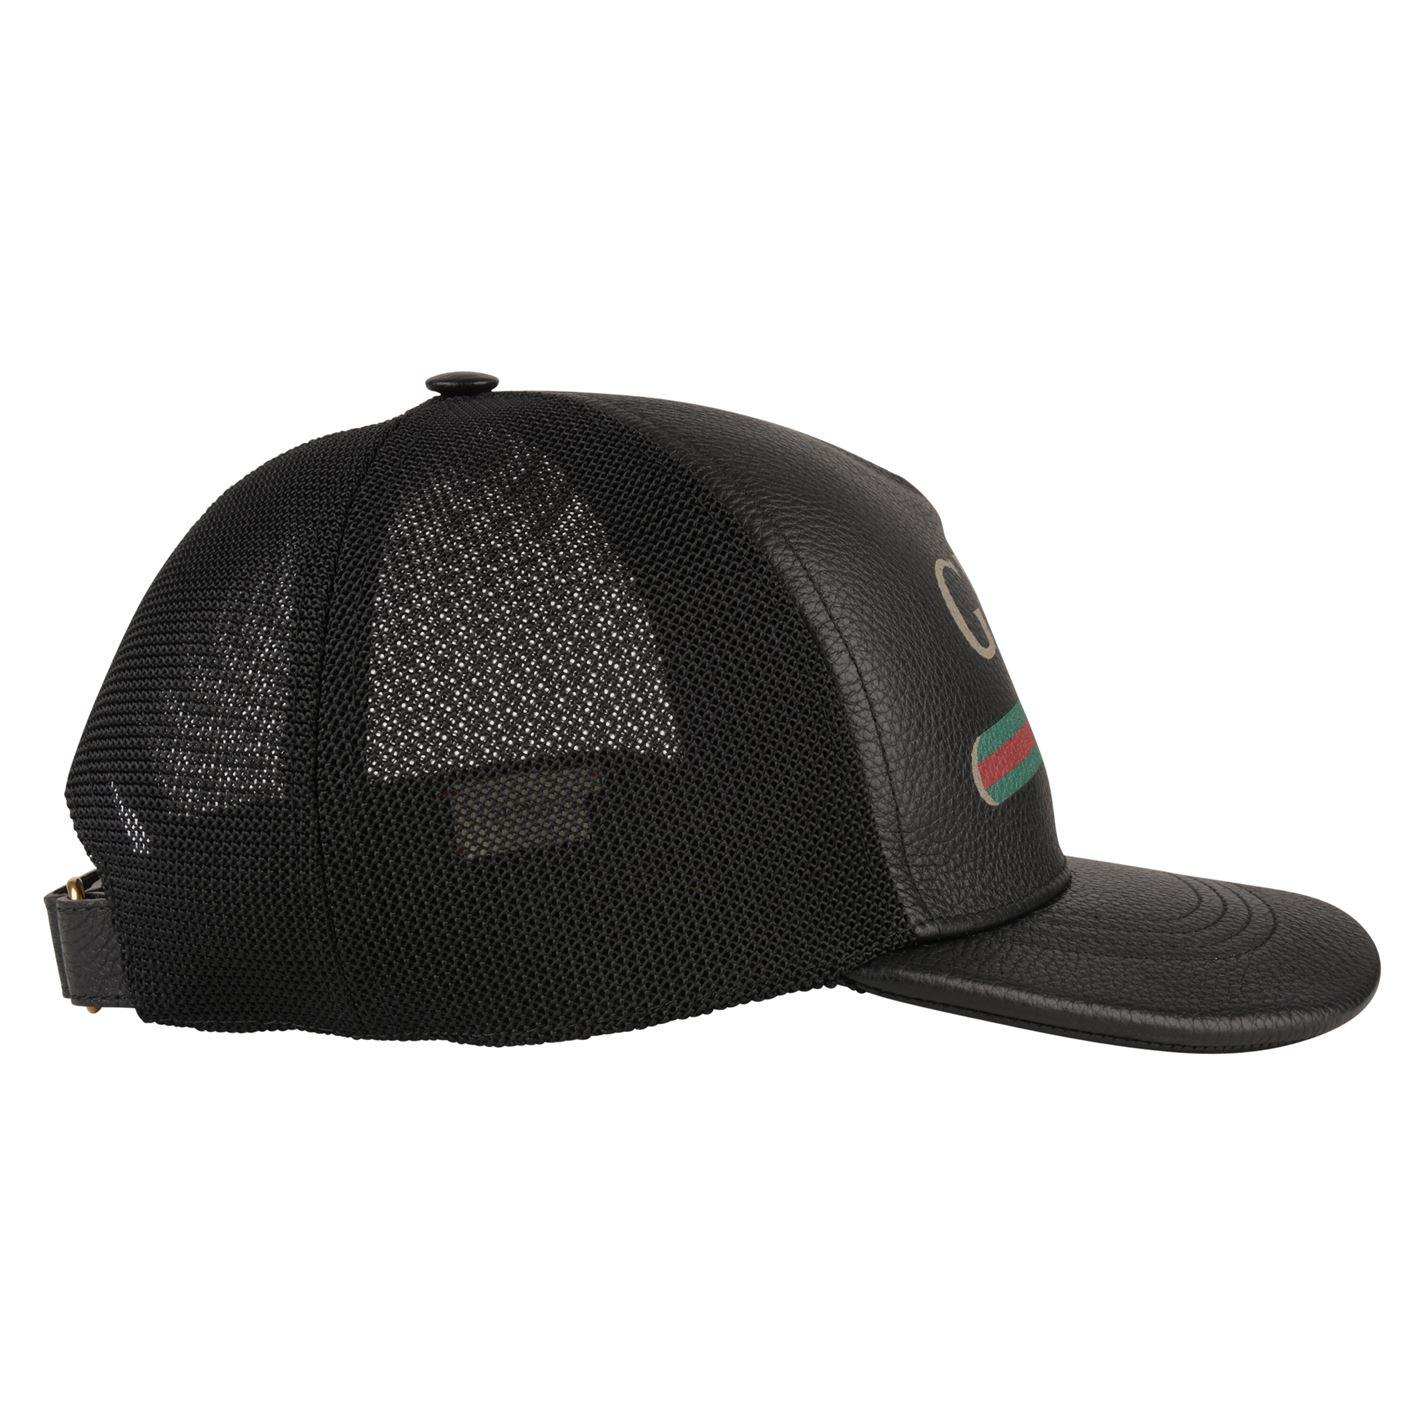 3d51fa3c14f7b Gucci Baseball Cap in Black for Men - Save 47% - Lyst